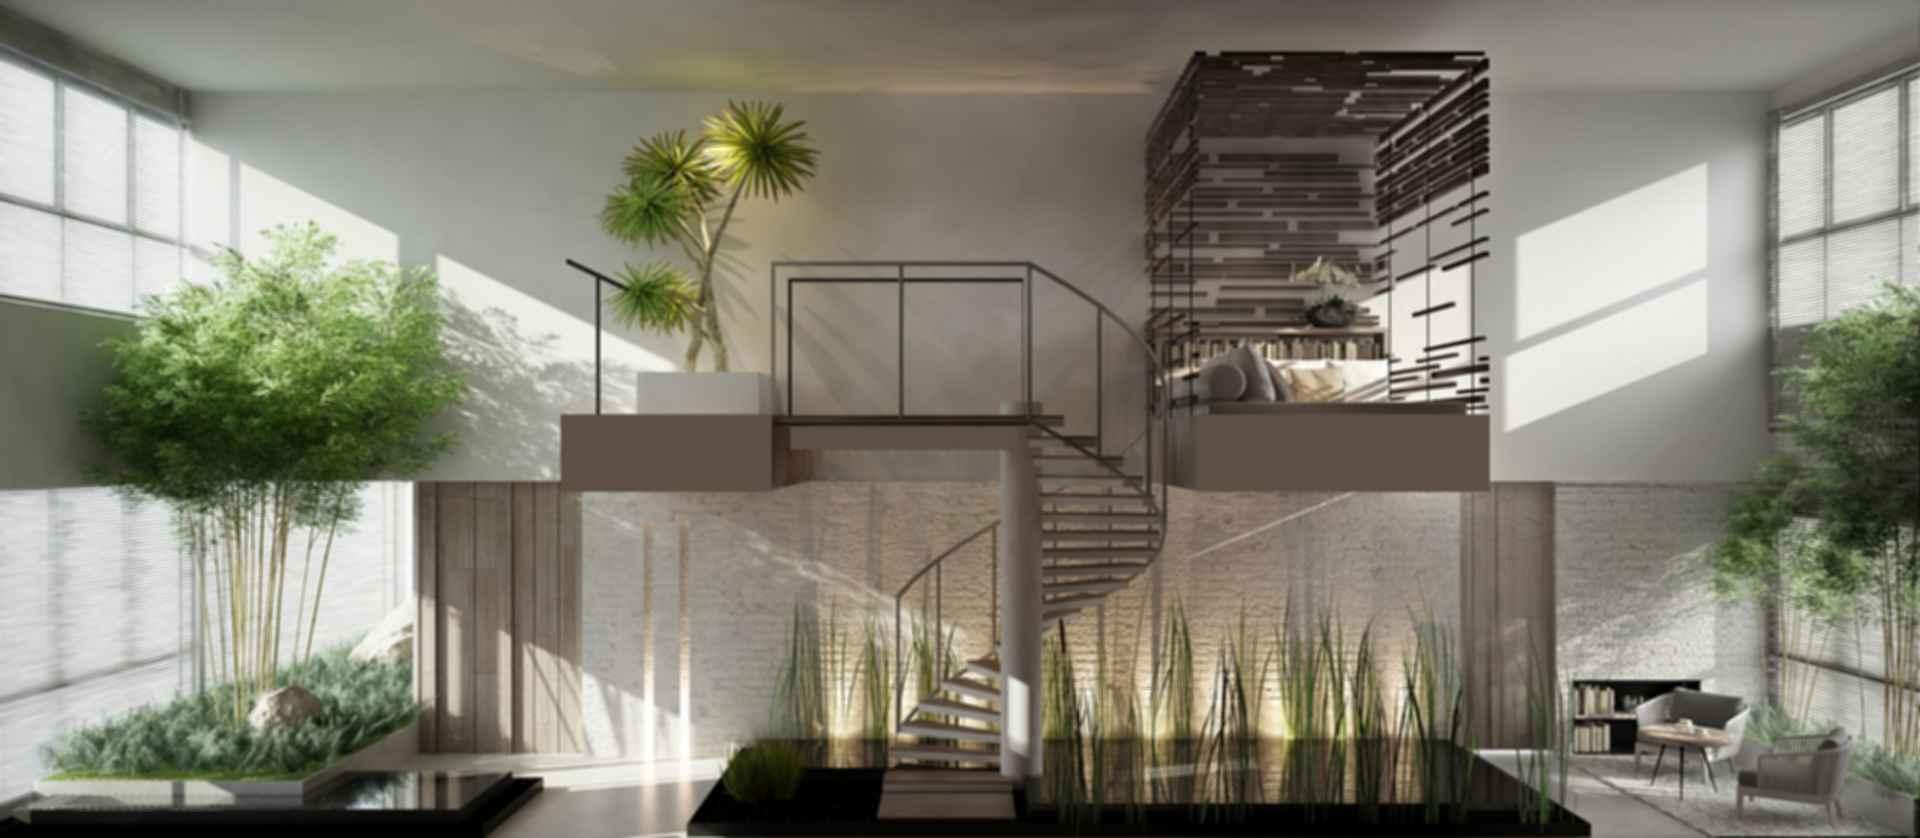 Penthouse Starhill - Interior